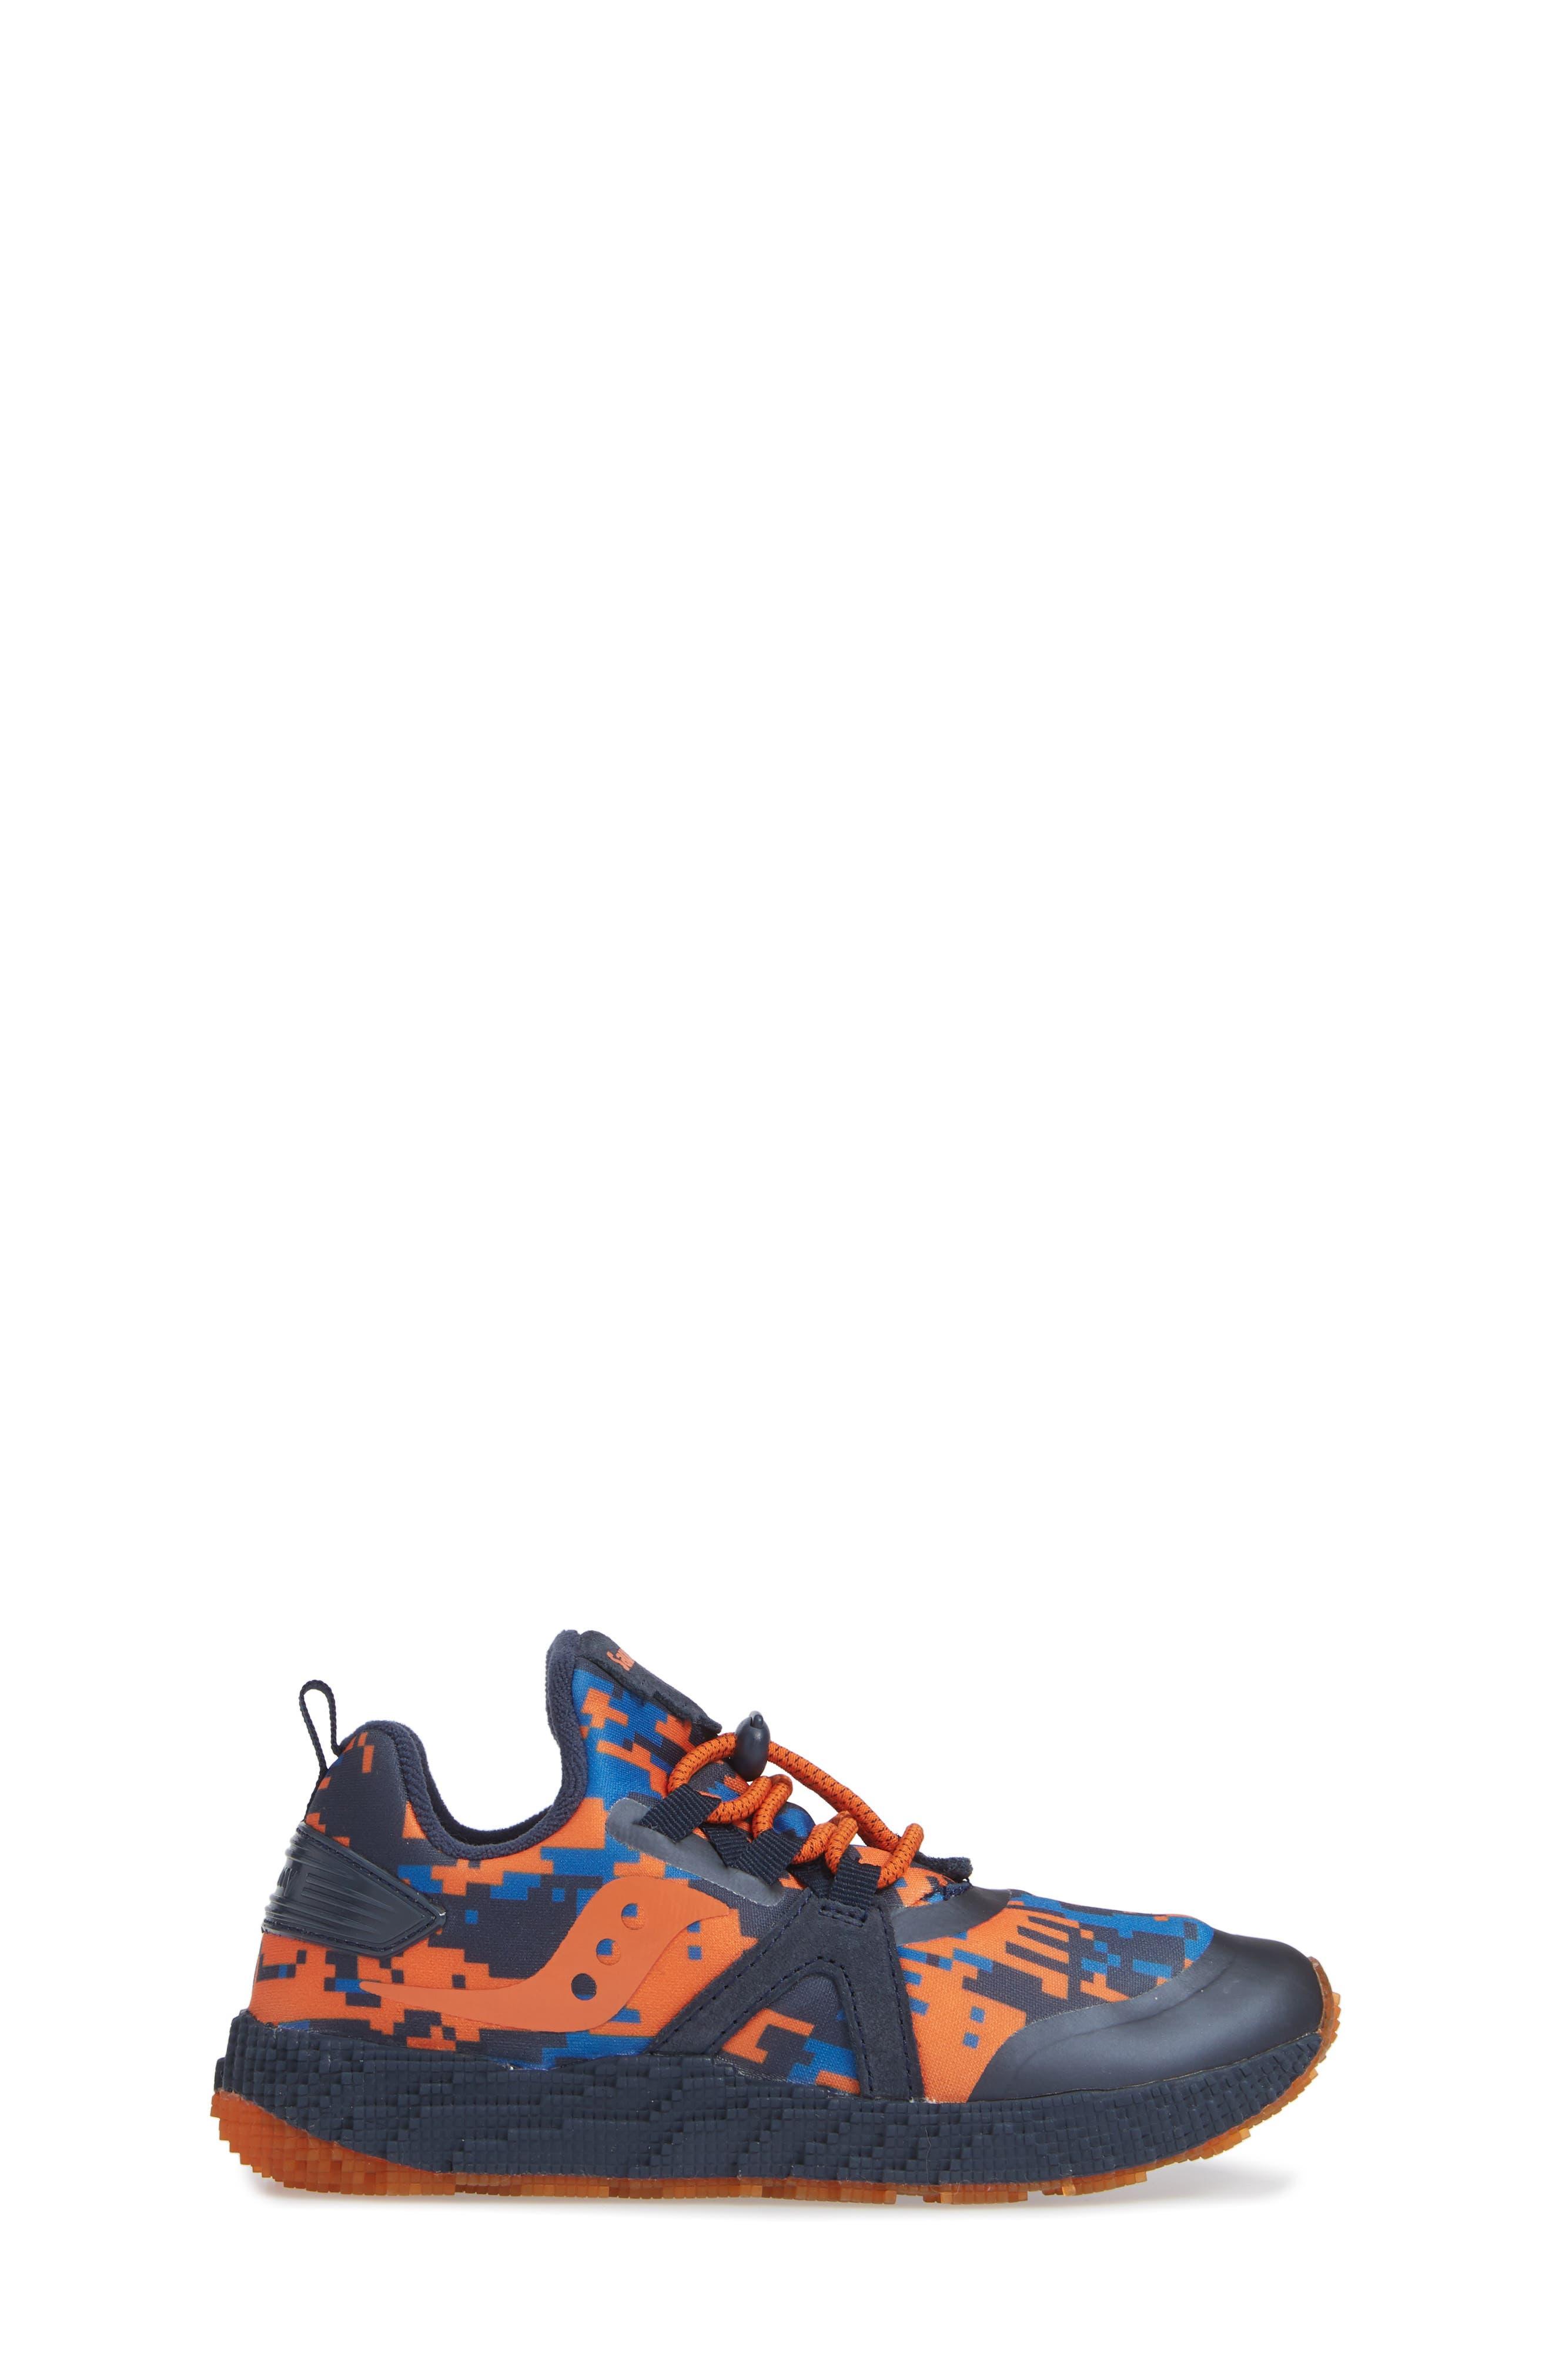 SAUCONY, Voxel 9000 Sneaker, Alternate thumbnail 3, color, BLUE LEATHER/ MESH